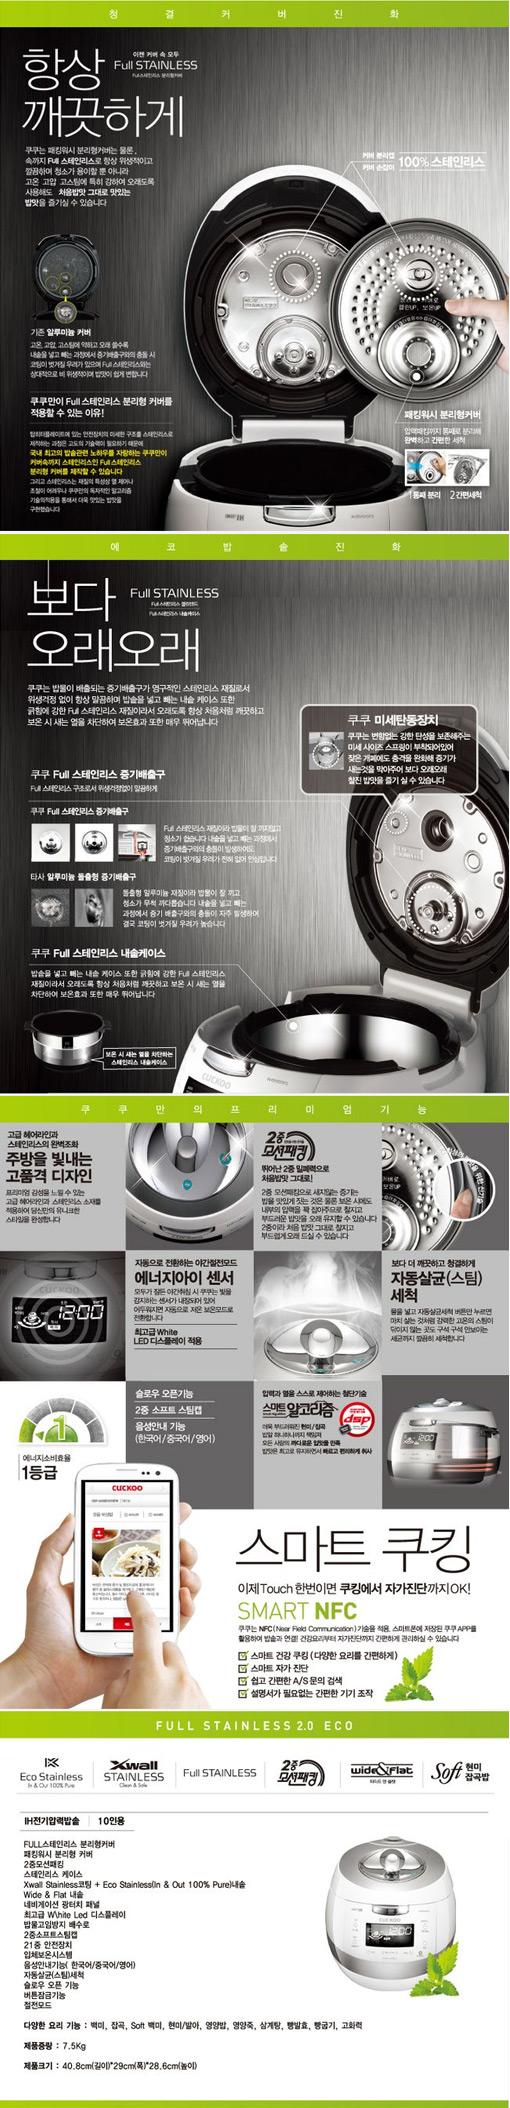 Full Stainless Eco IH Pressure Rice Cooker/Warmer CRP-AHSS1009FN (10 Cups)2